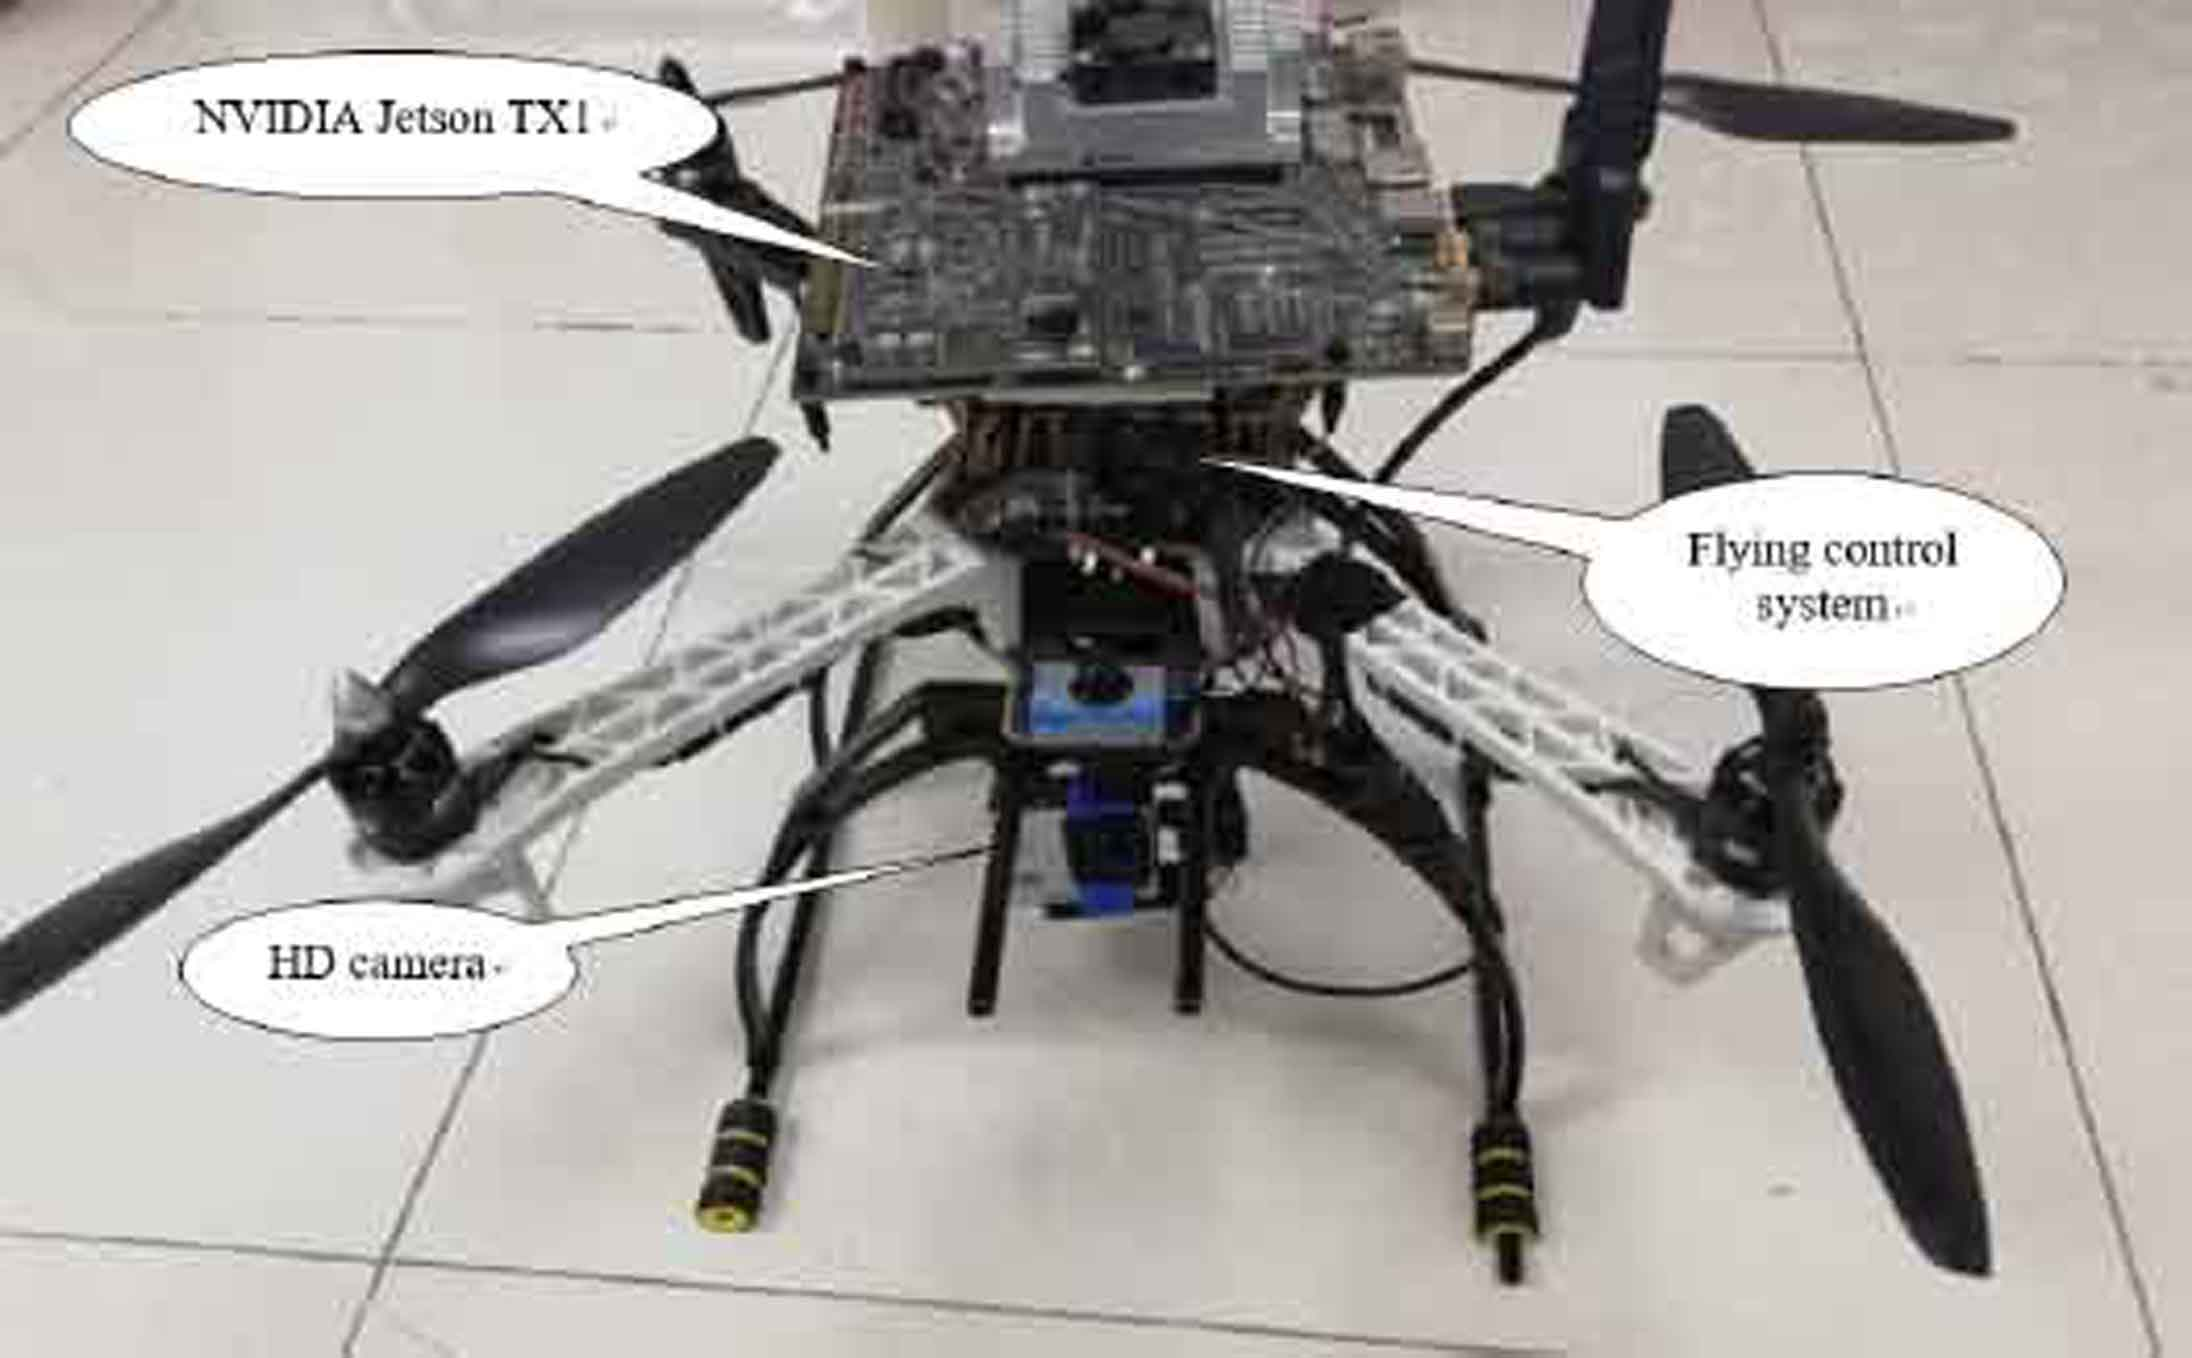 Using YOLO-based pedestrian detection for monitoring UAV